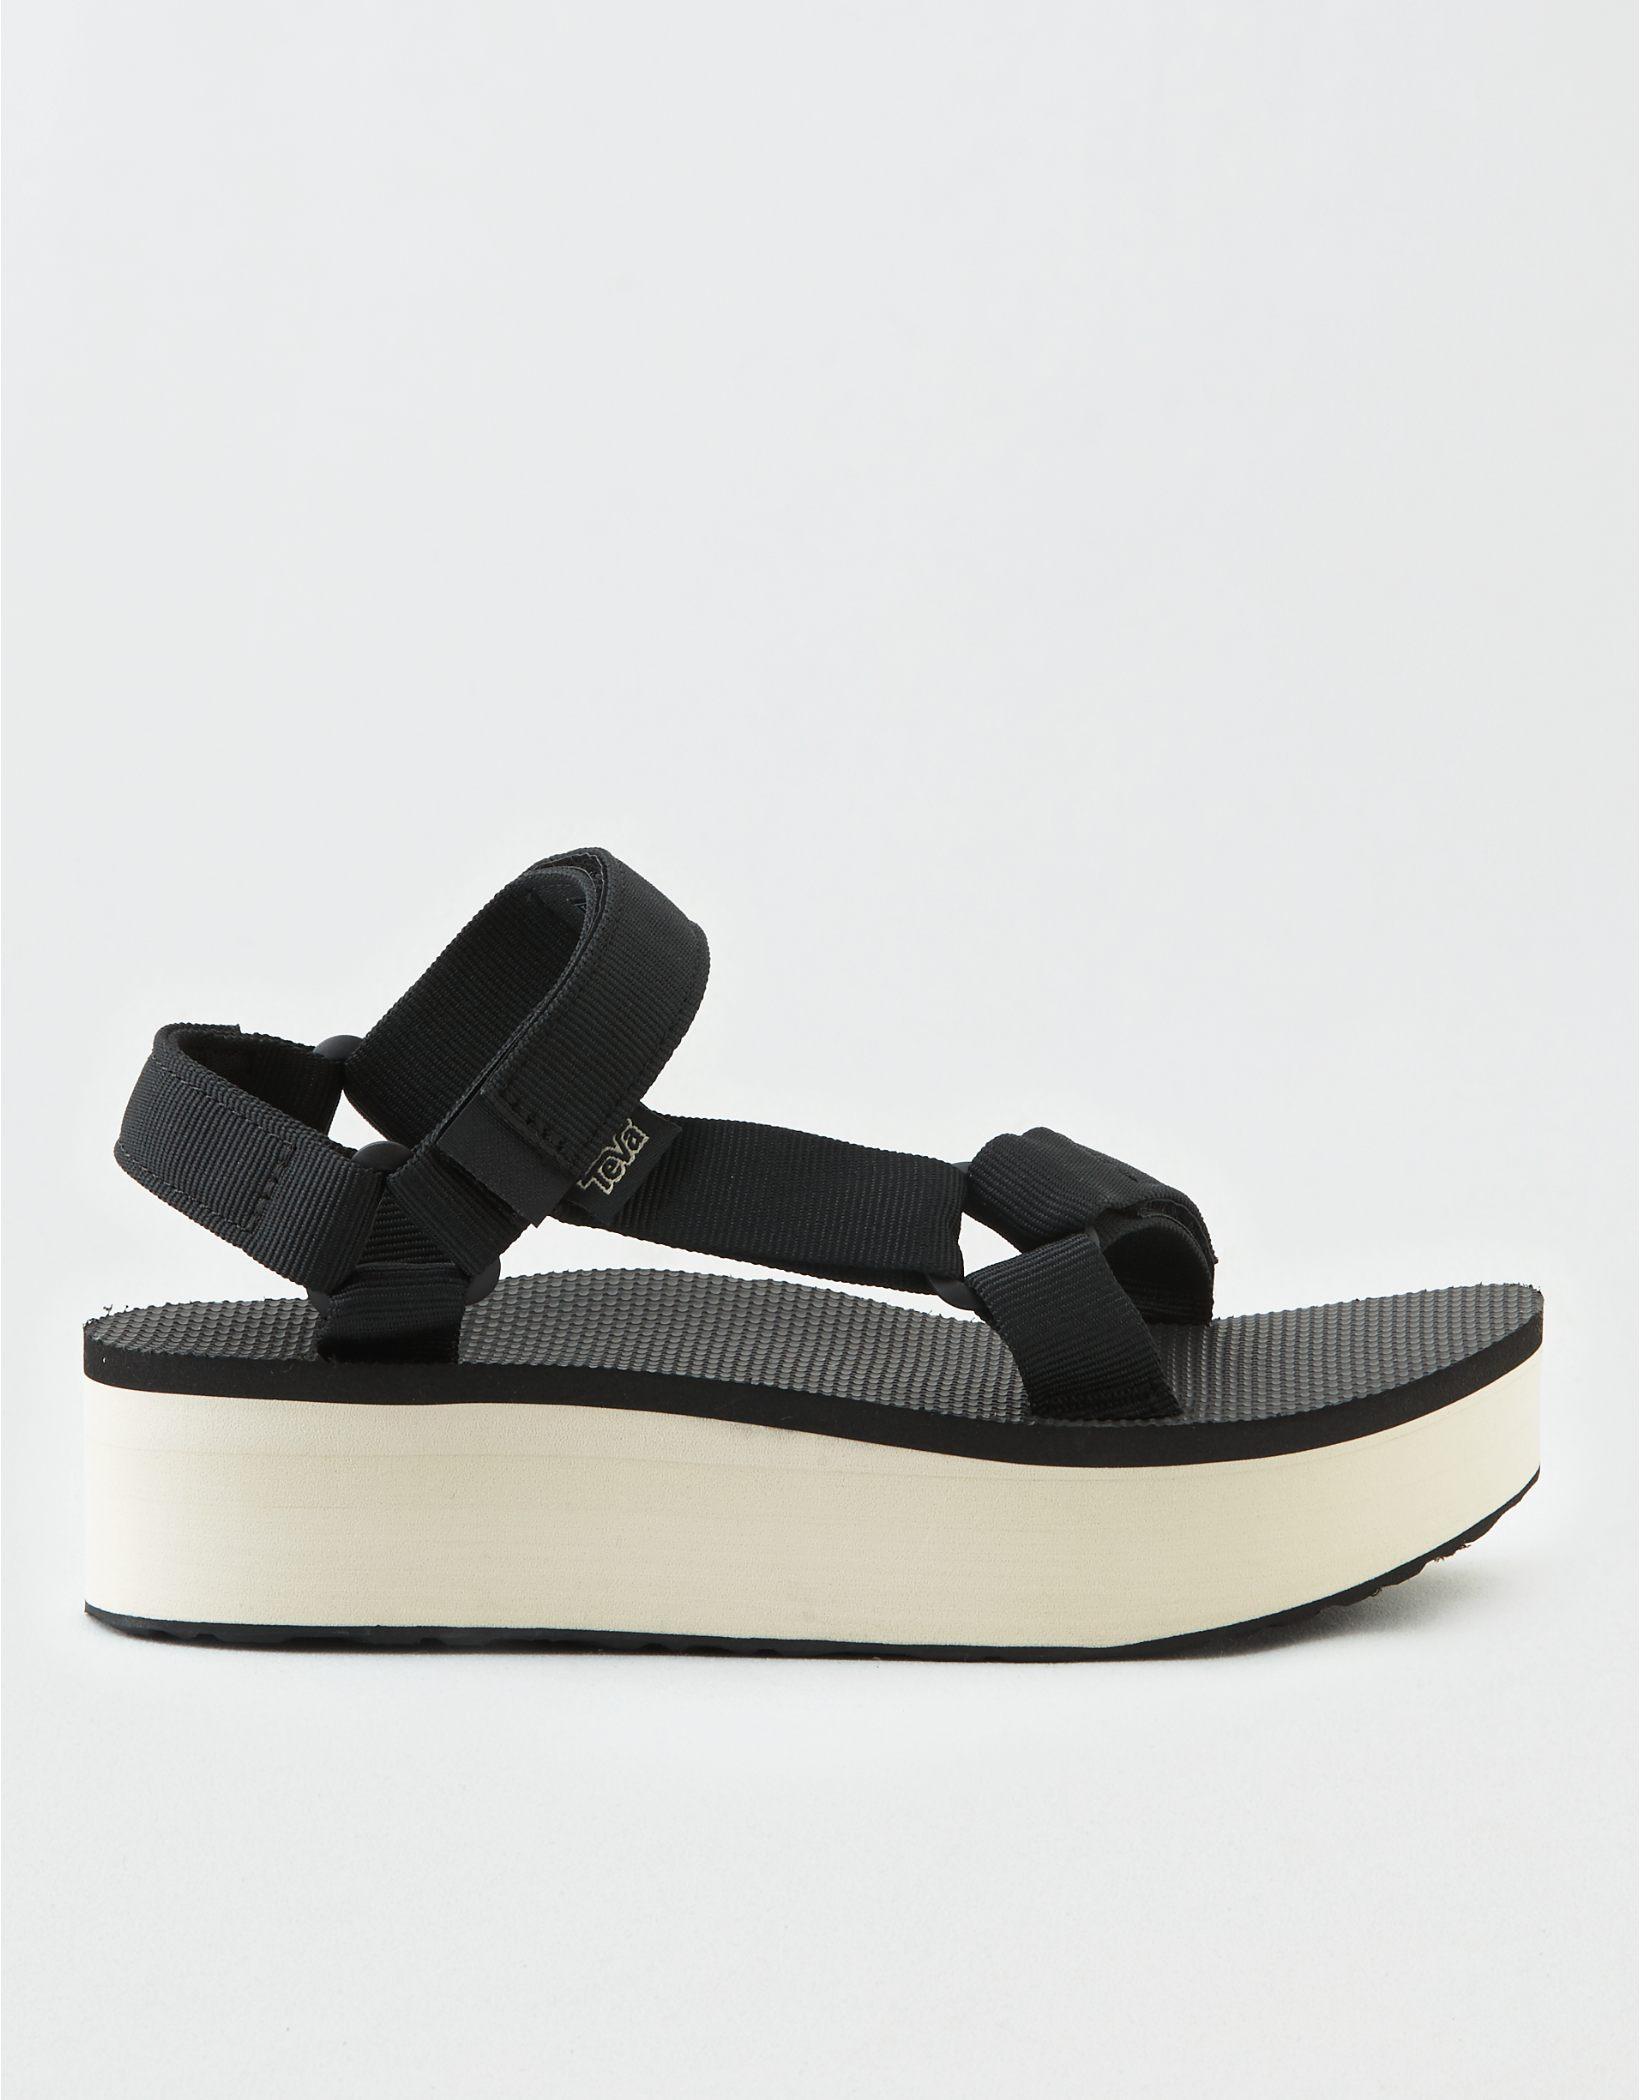 TEVA Original Flatform Universal Sandal